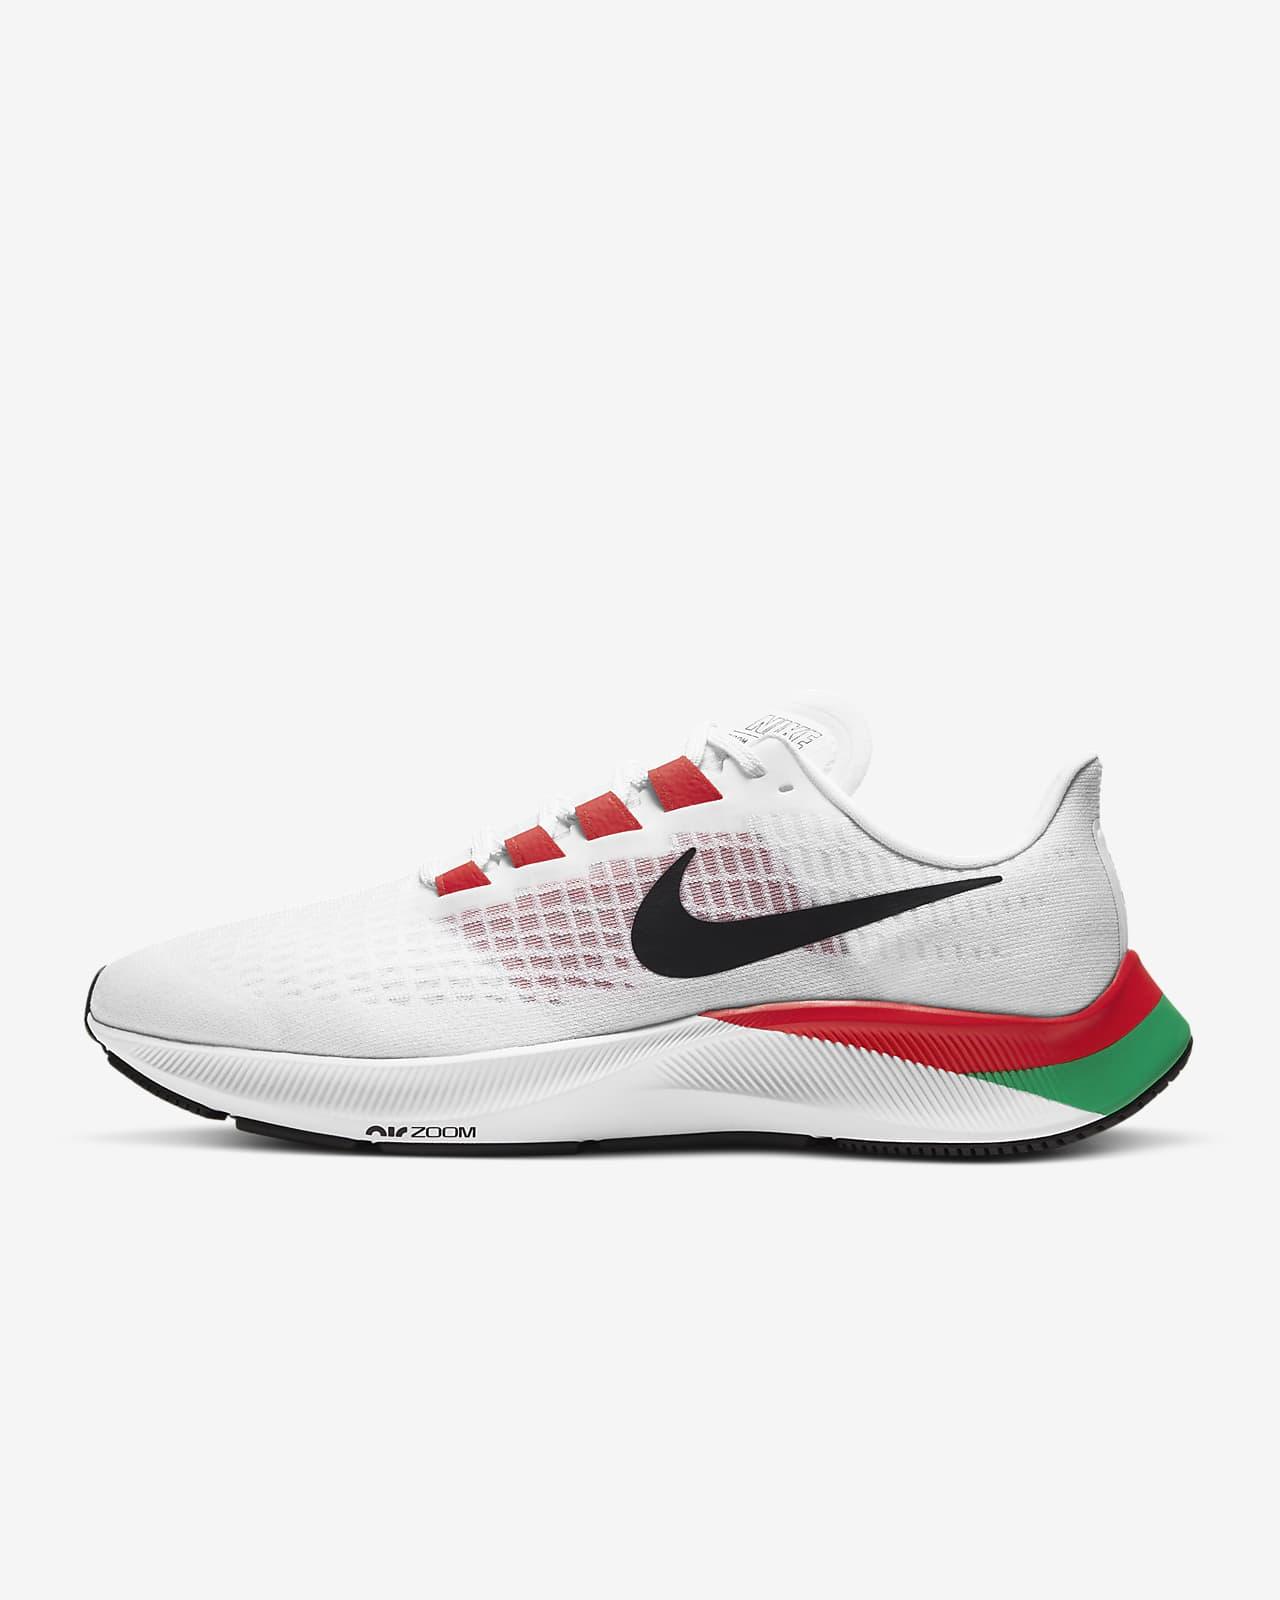 Nike Air Zoom Pegasus 37 Eliud Kipchoge Men's Running Shoe